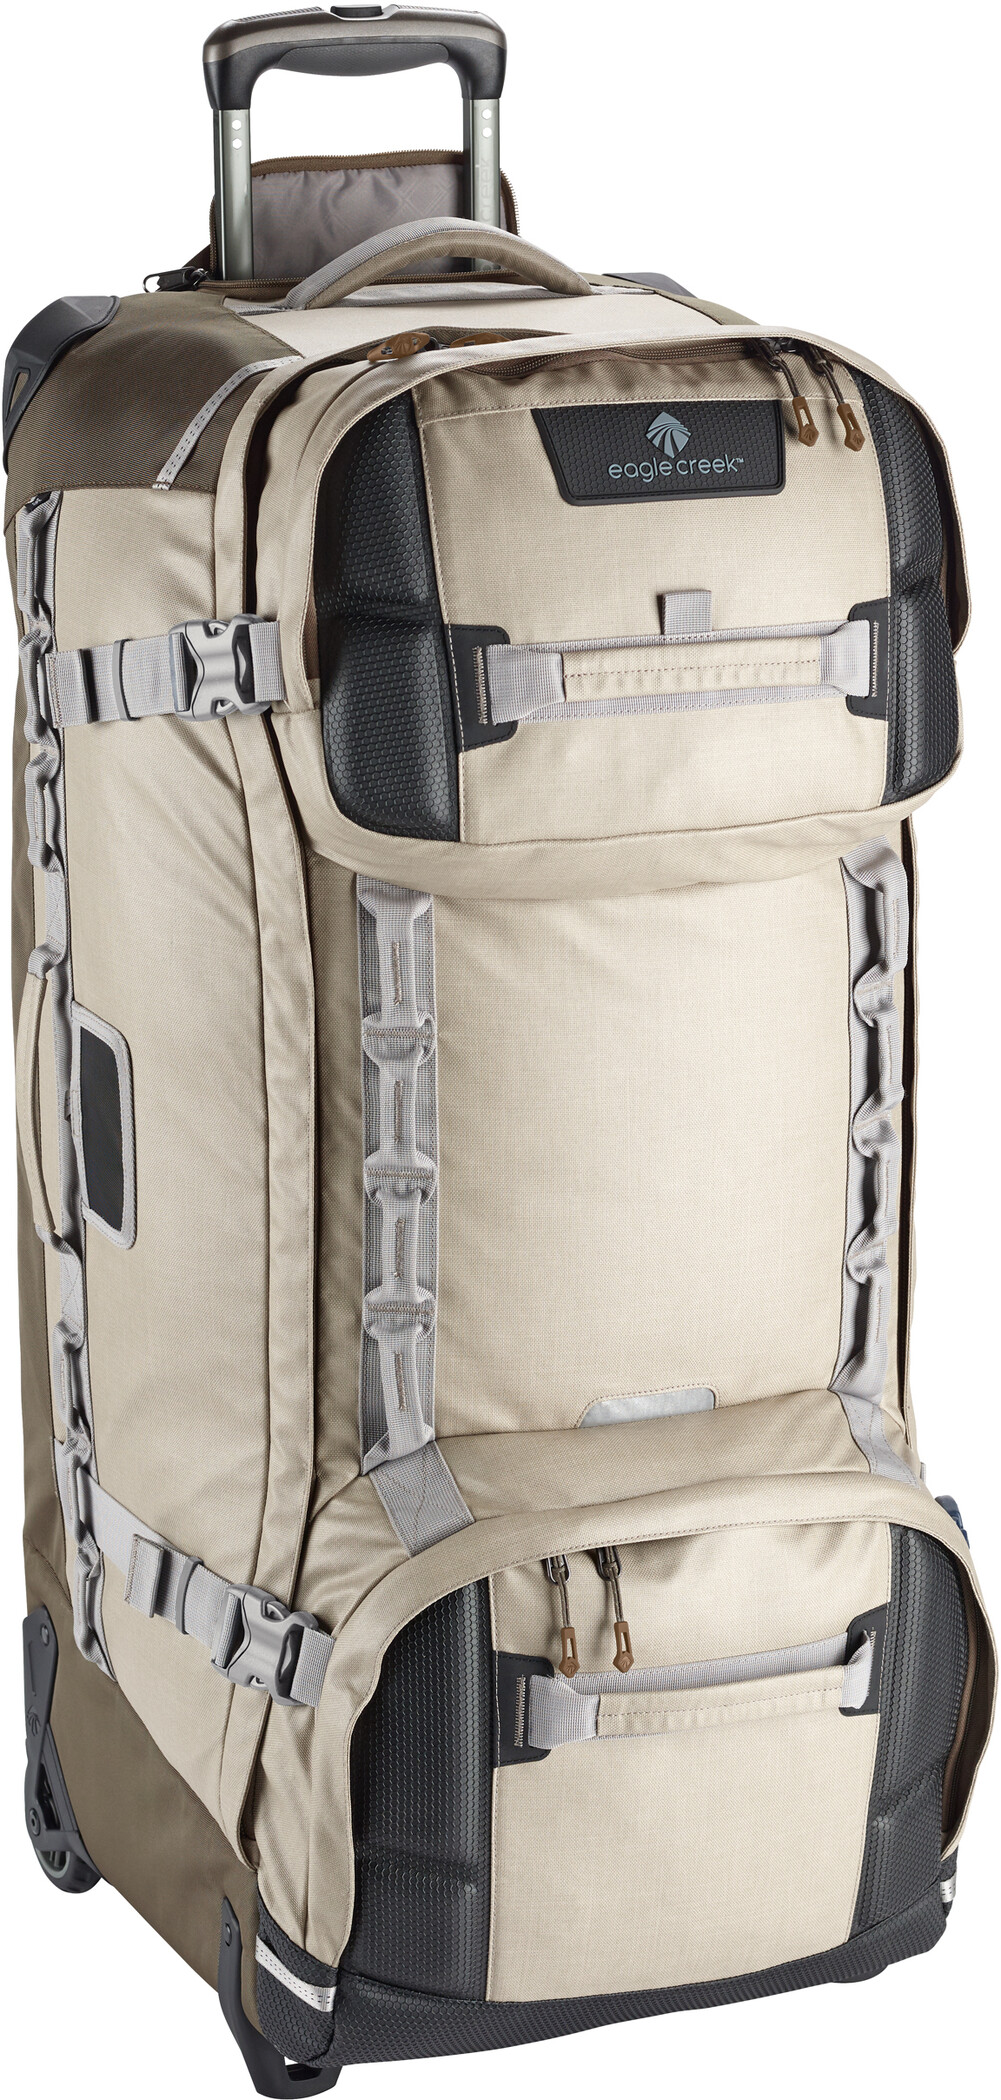 Fjaellraeven Campz Gear Bag Azul esneceser Large 3lKJF1cT